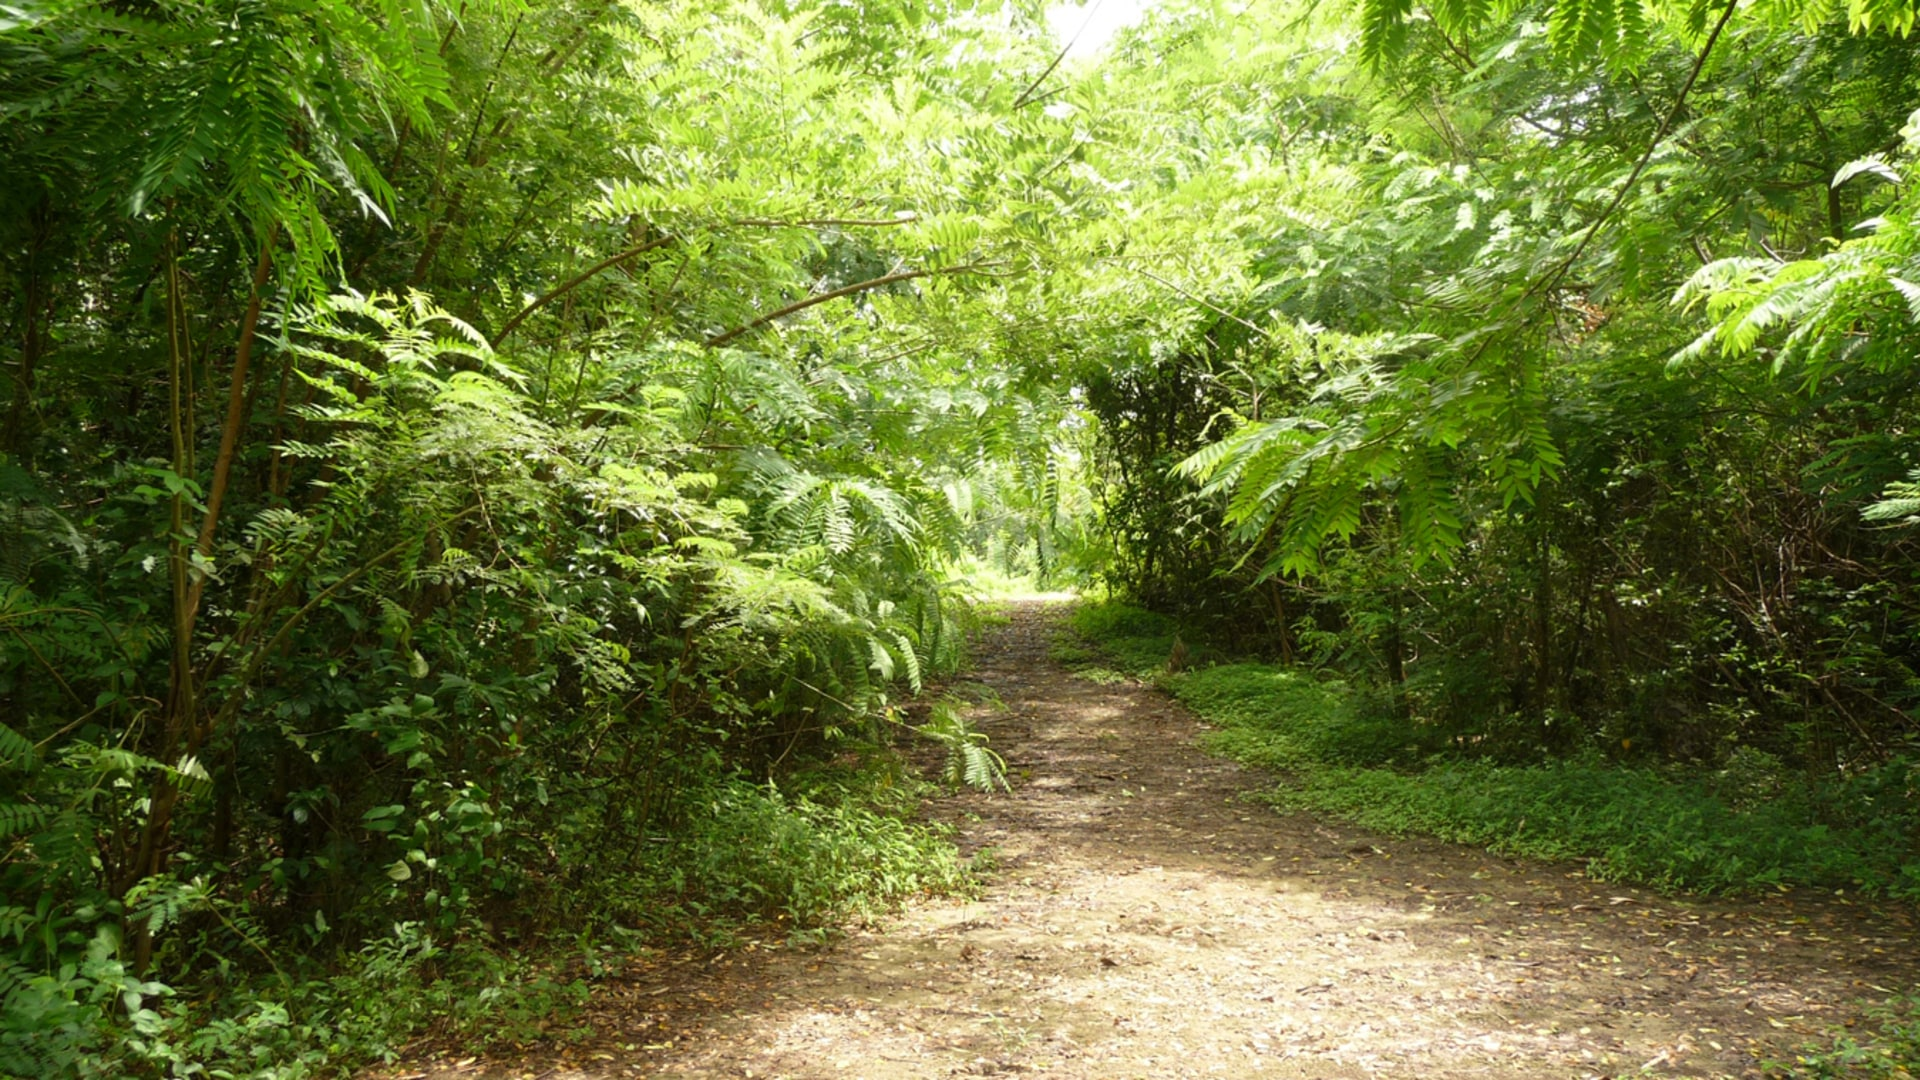 EBs Forest - Land - Property for Sale in Grenada - Terra Caribbean